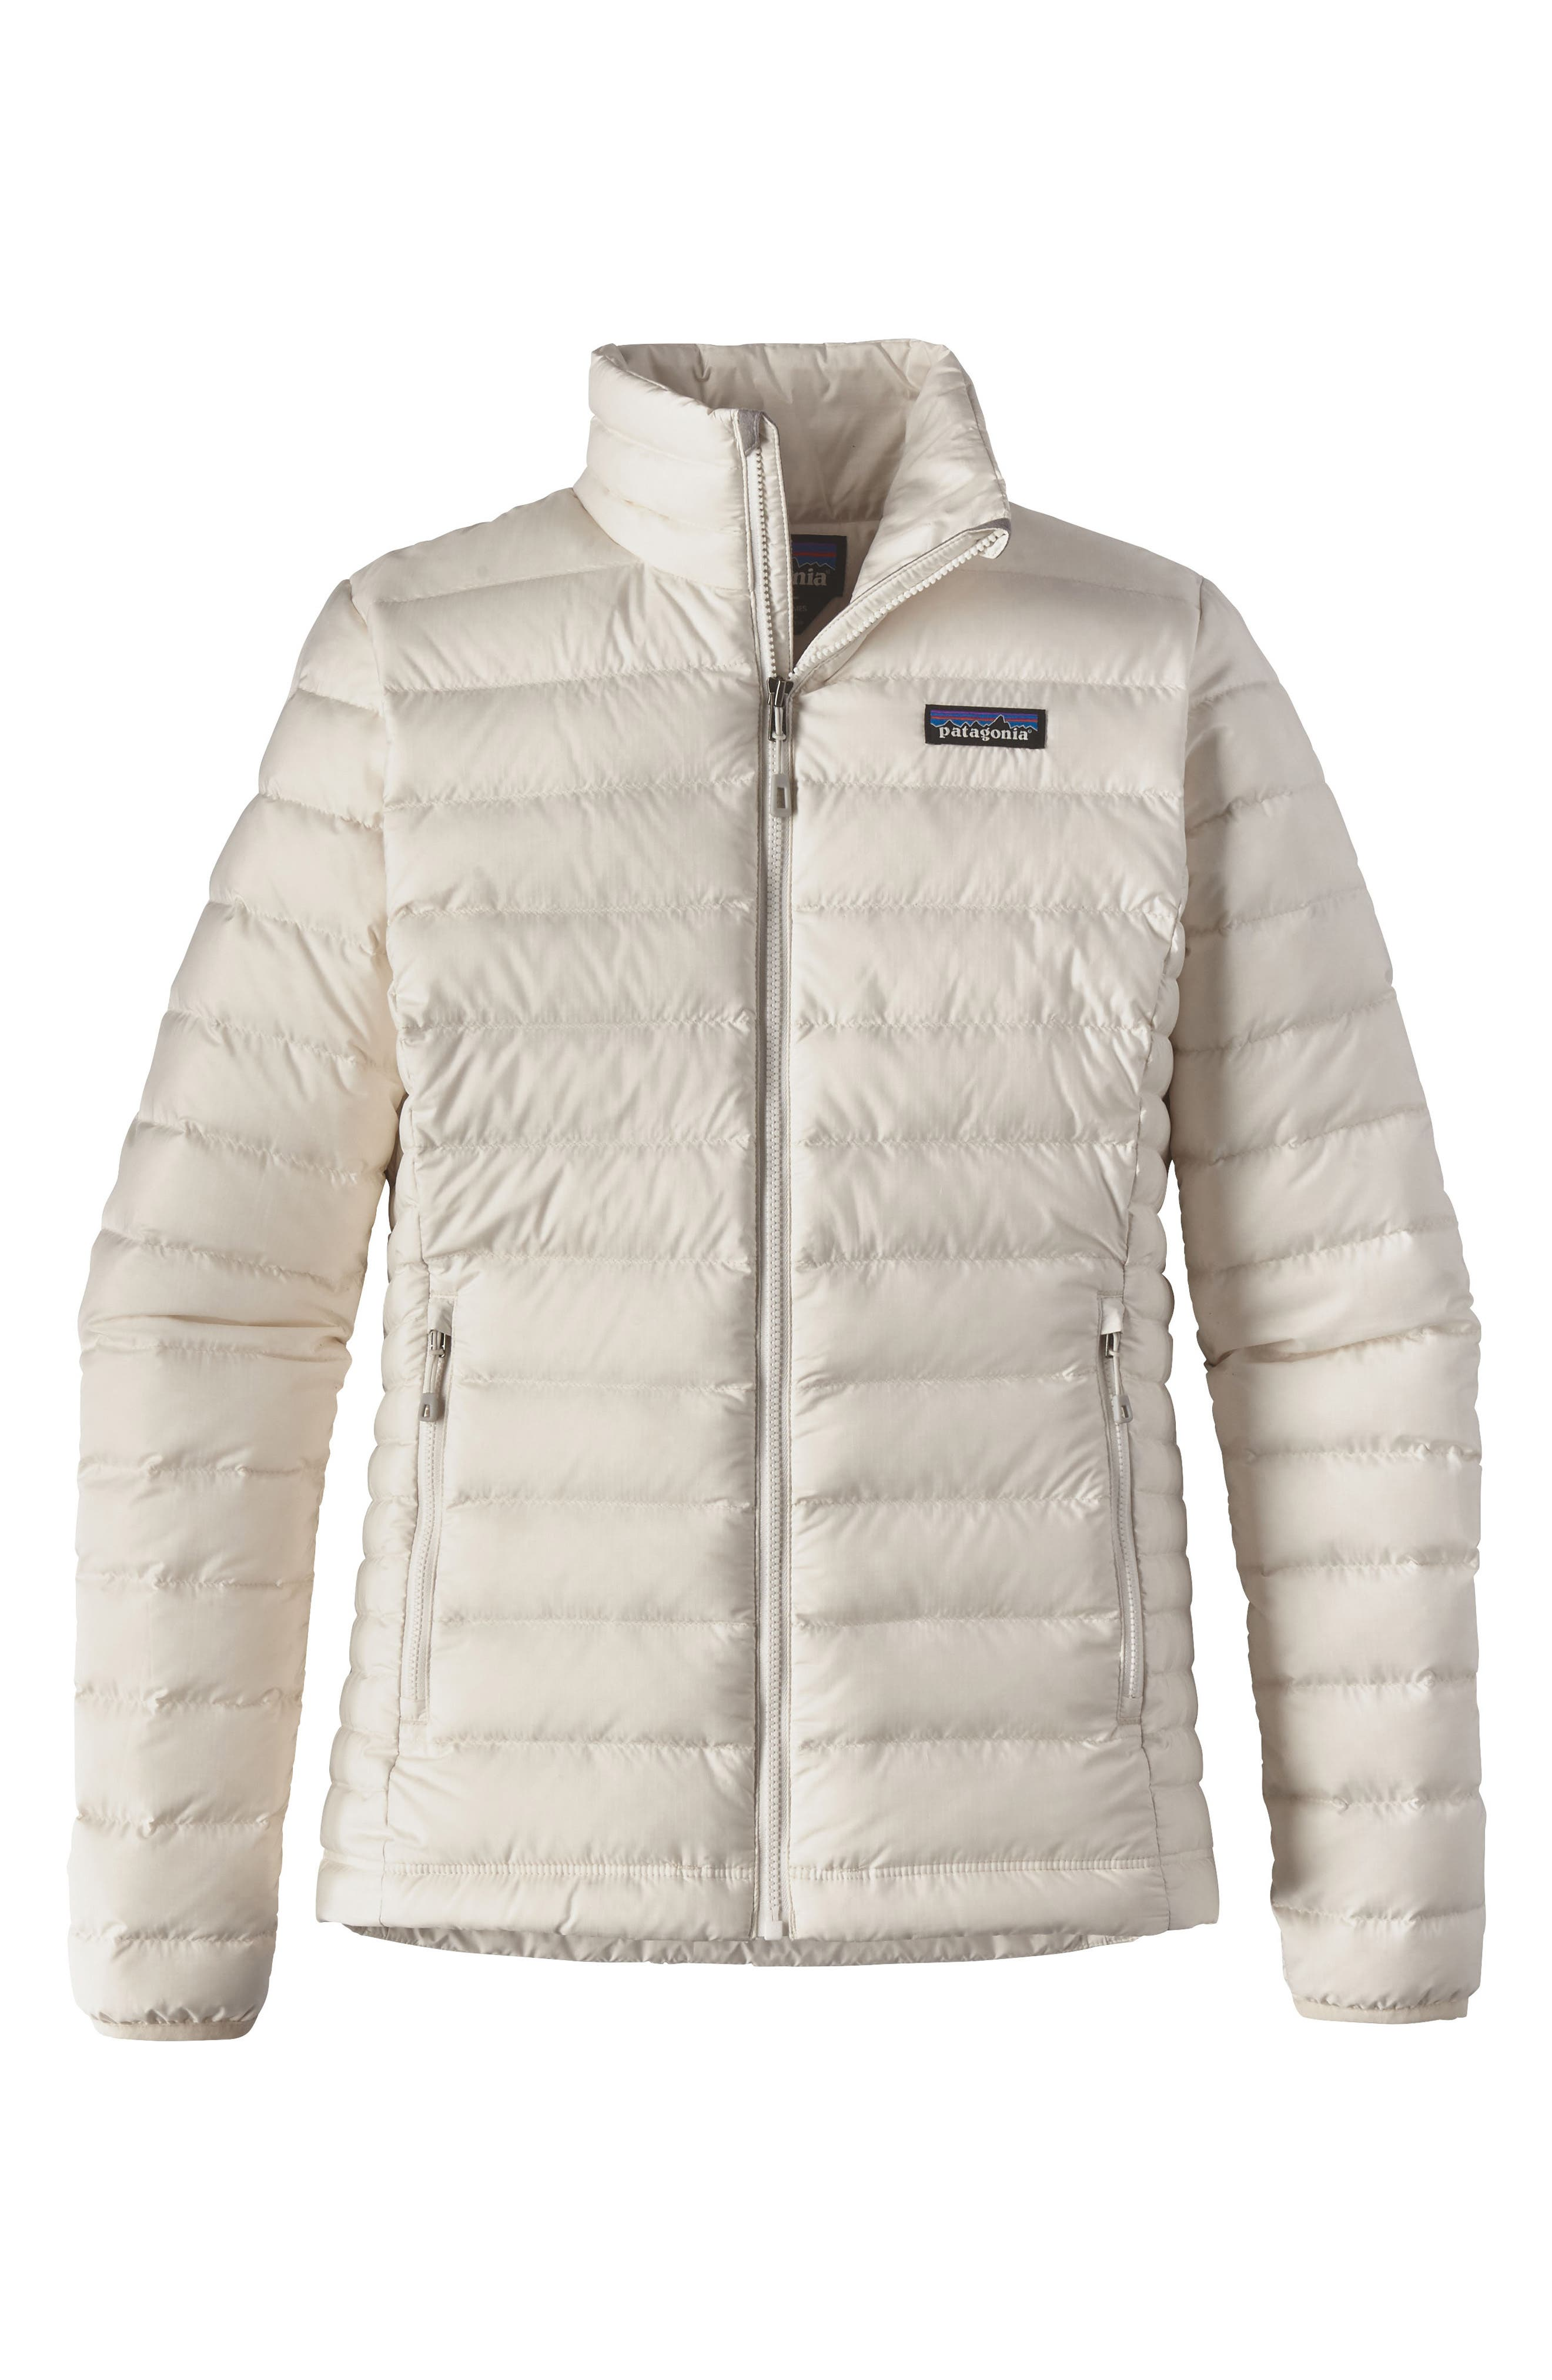 Patagonia Down Jacket, White